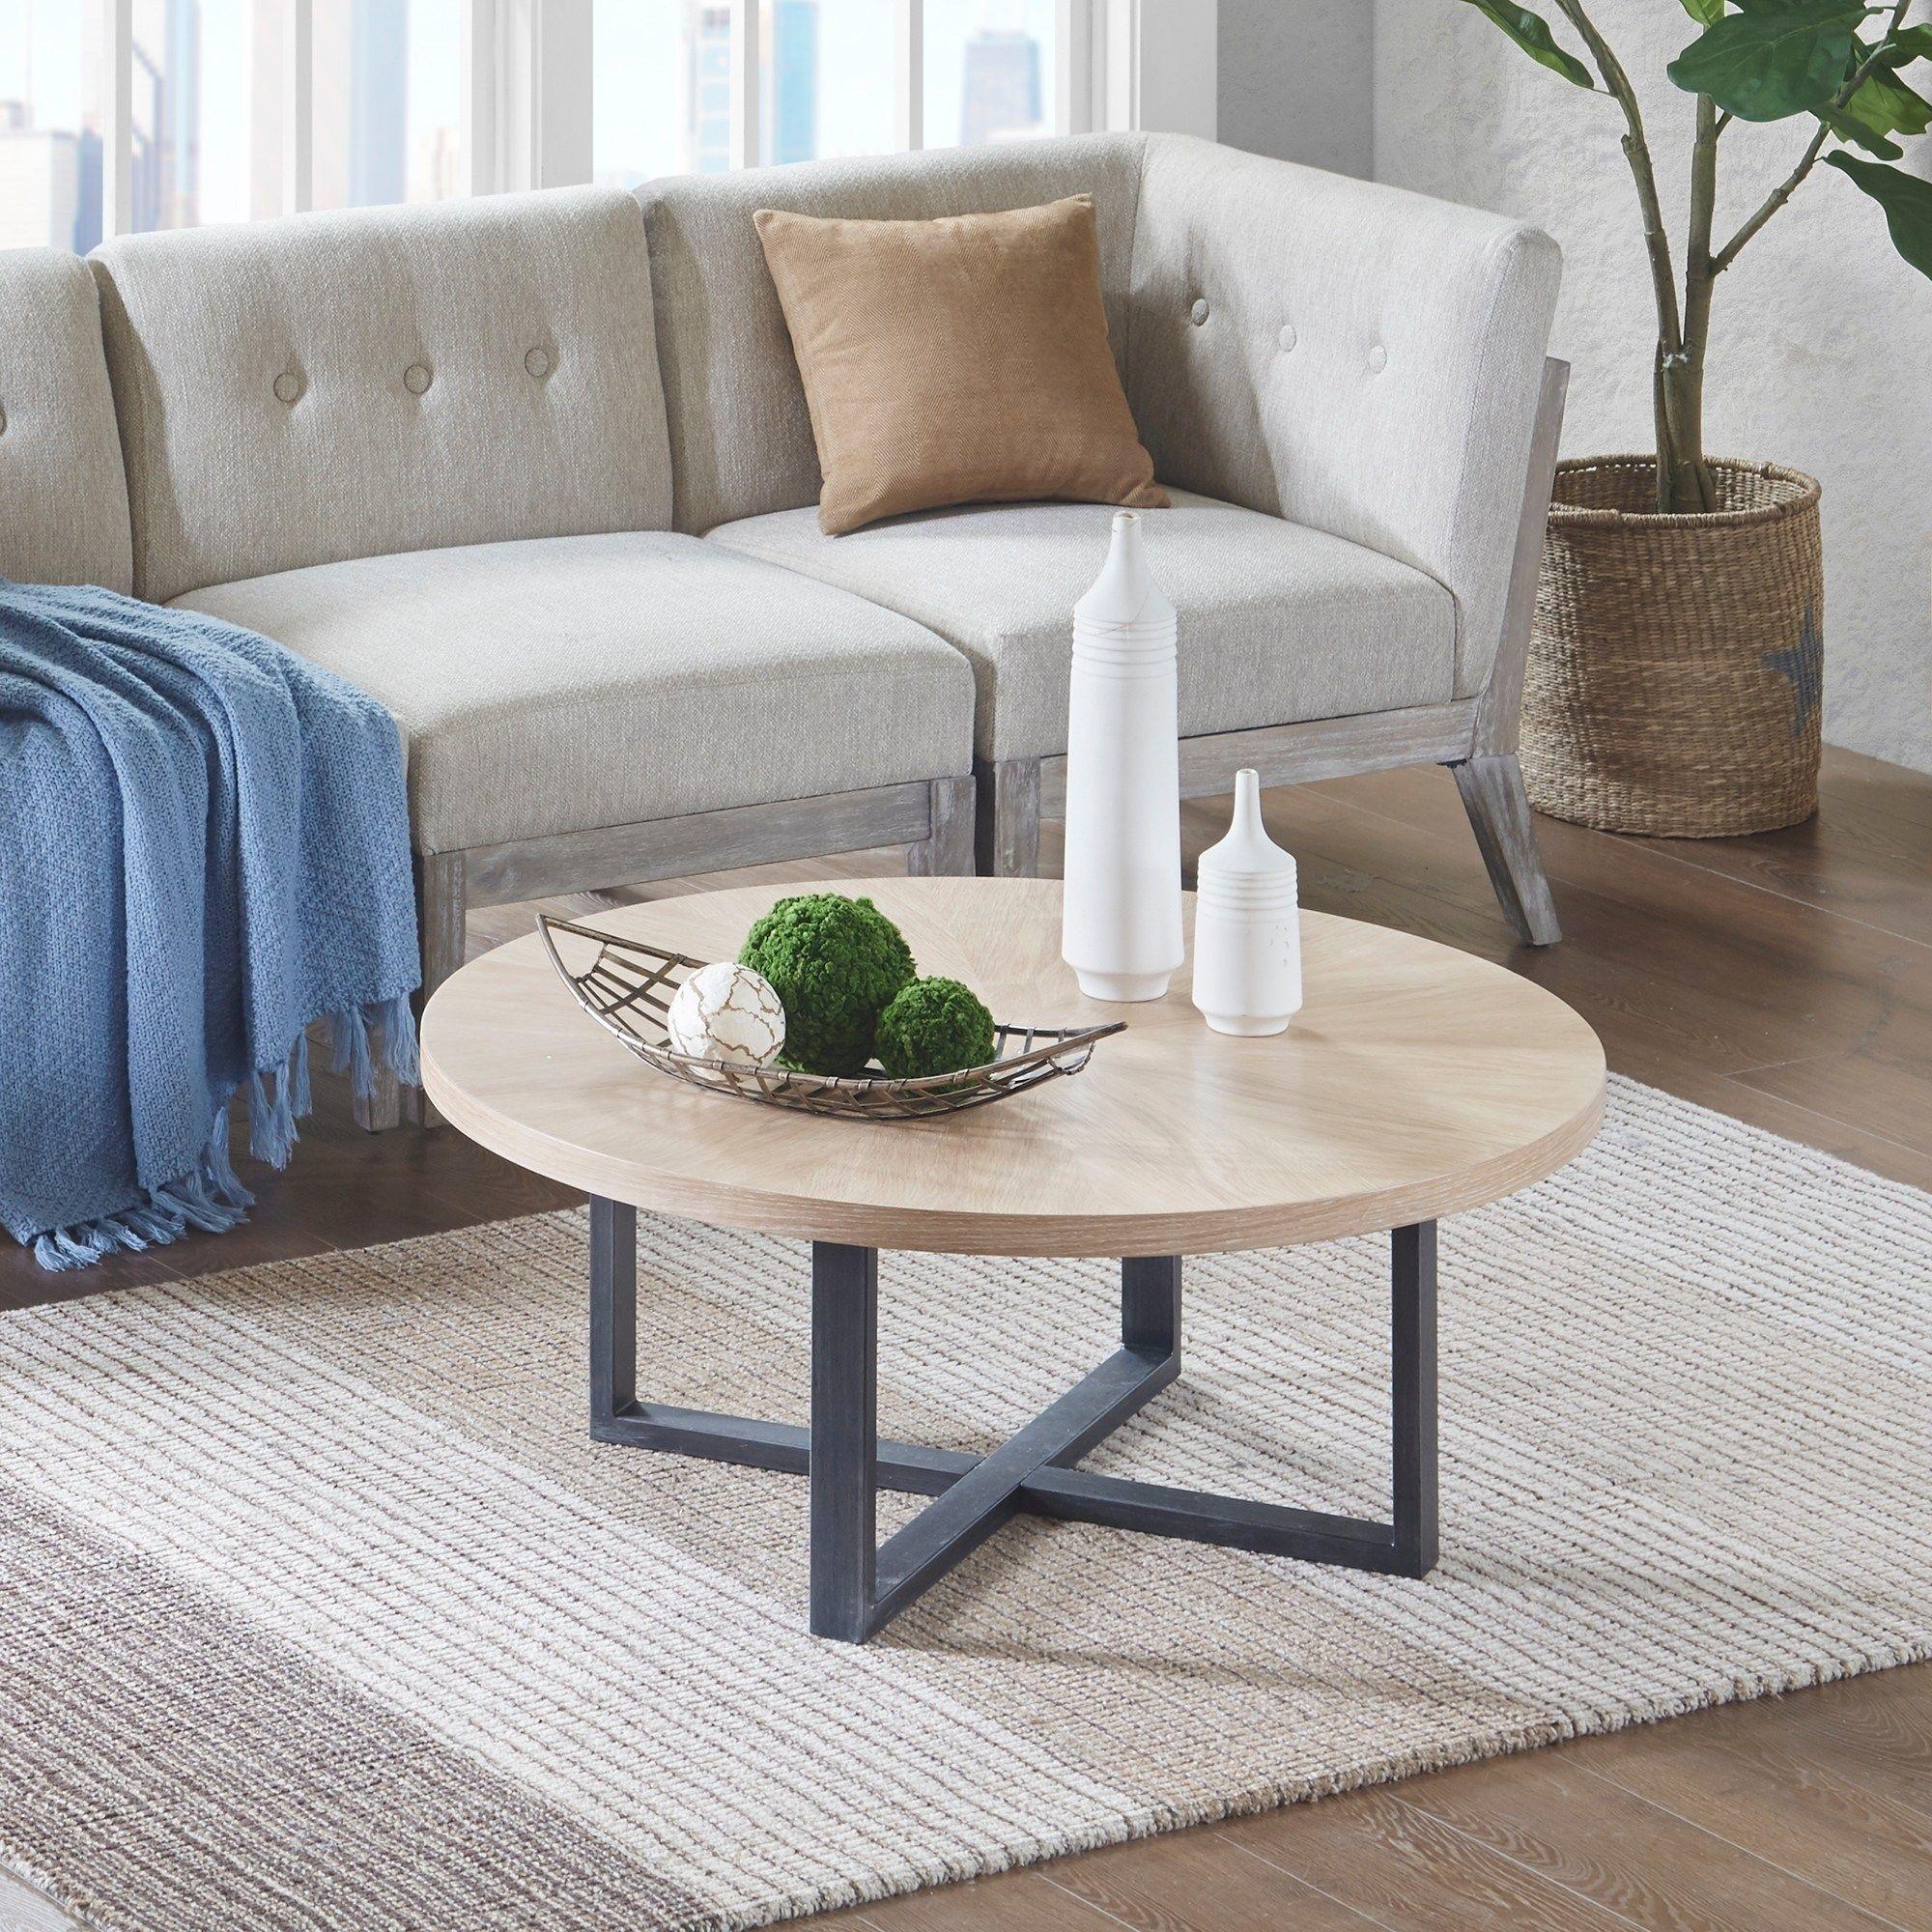 Lunnarp Coffee Table White 35 3 8x21 5 8 Ikea Quality Living Room Furniture Coffee Table Coffee Table White [ 2000 x 2000 Pixel ]